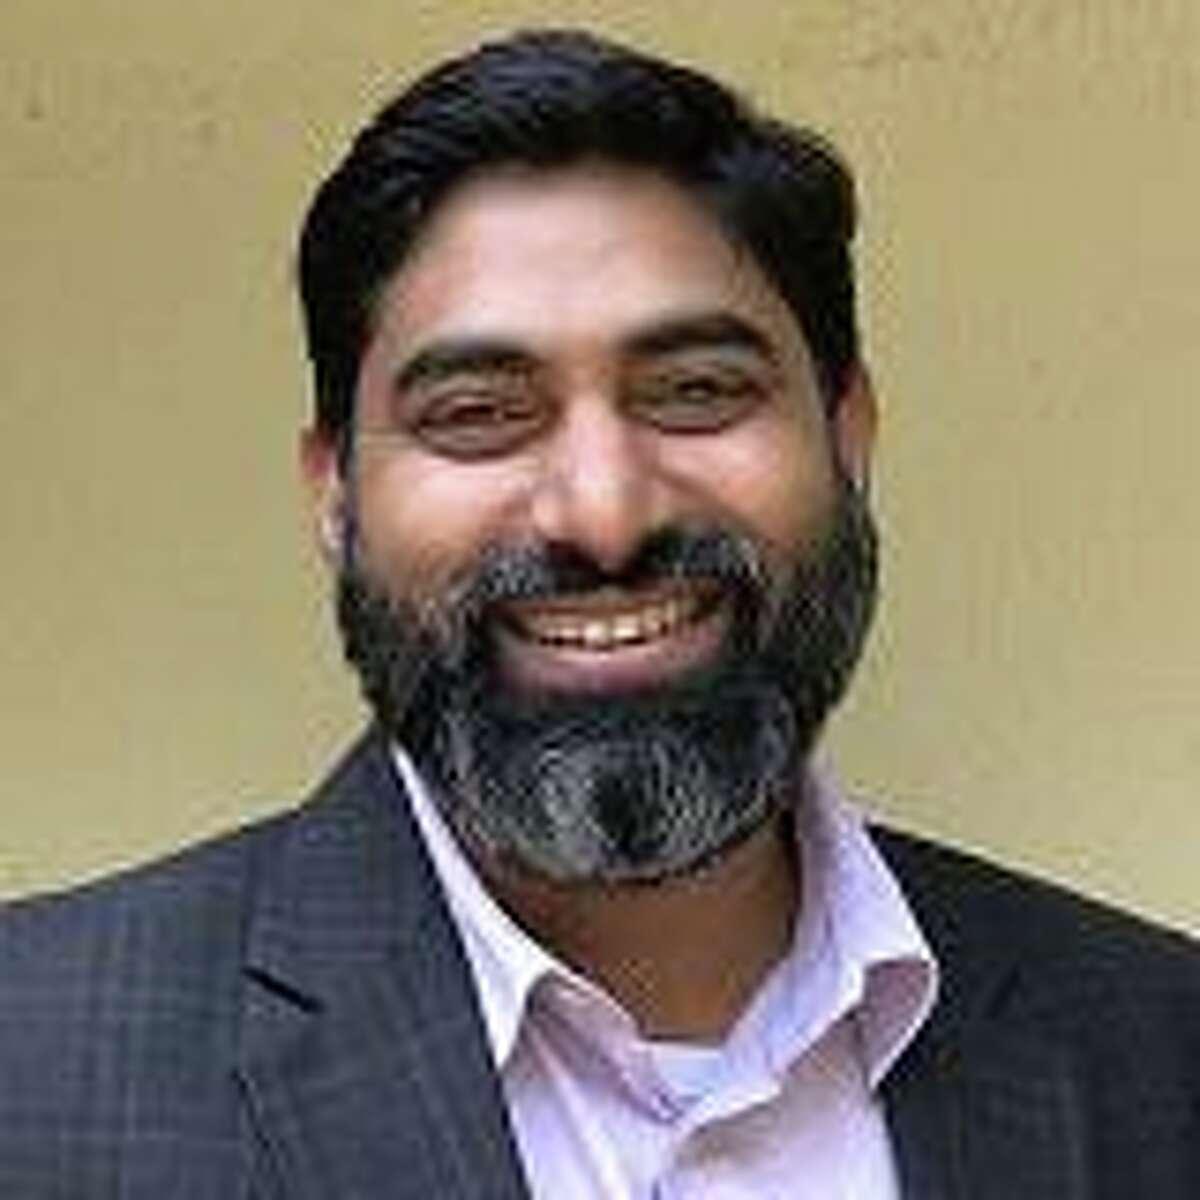 Deval Sanghavi is the founder of Dasra, an Indian nonprofit organization based in Mumbai. Sanghavi was born and raised in Sugar Land.